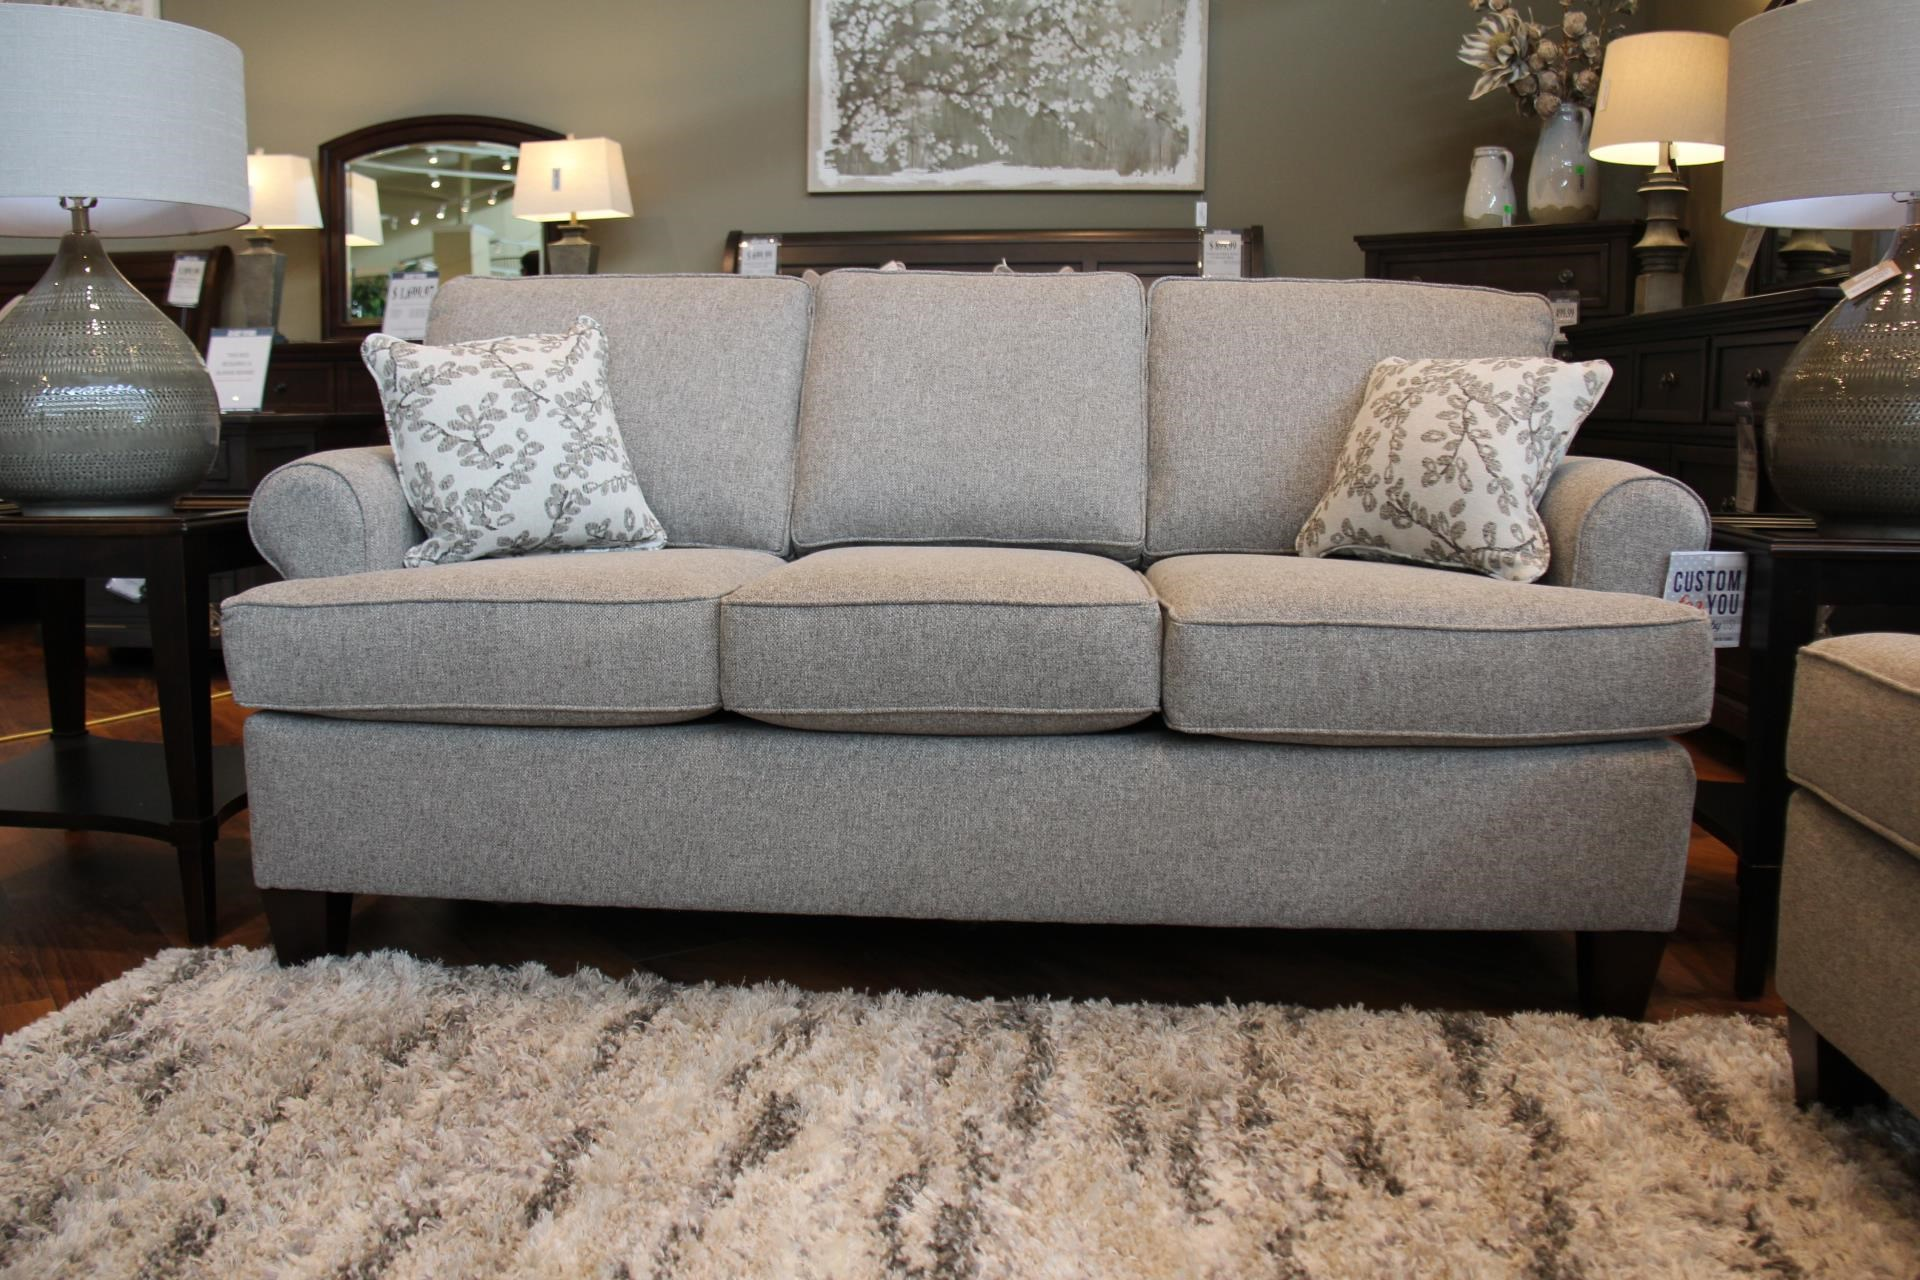 Brentwood Pepper Sofa